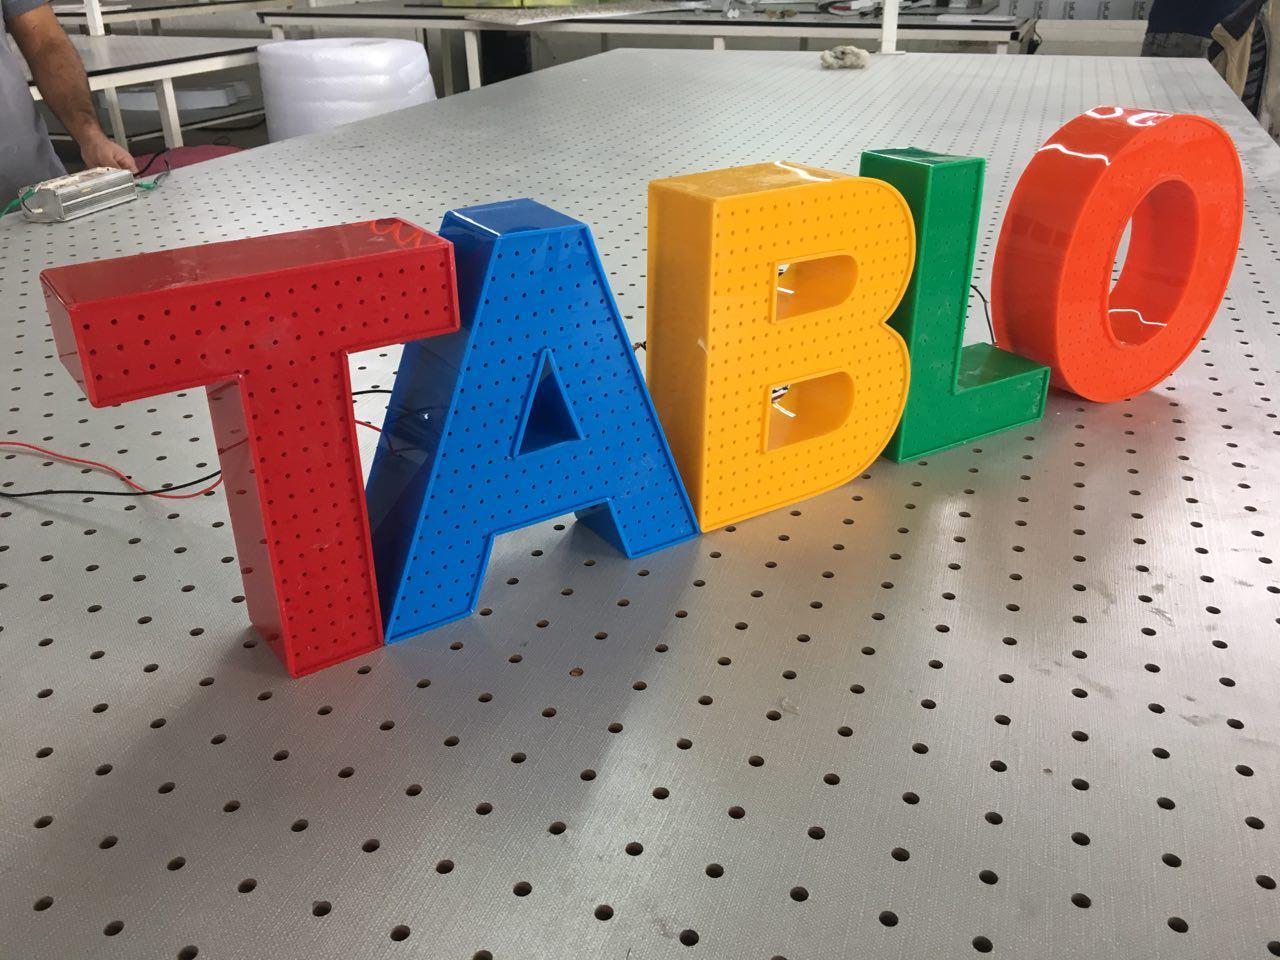 تابلوسازی حروف برجسته پلاستیک ،تابلو حروف برجسته پلکسی گلس